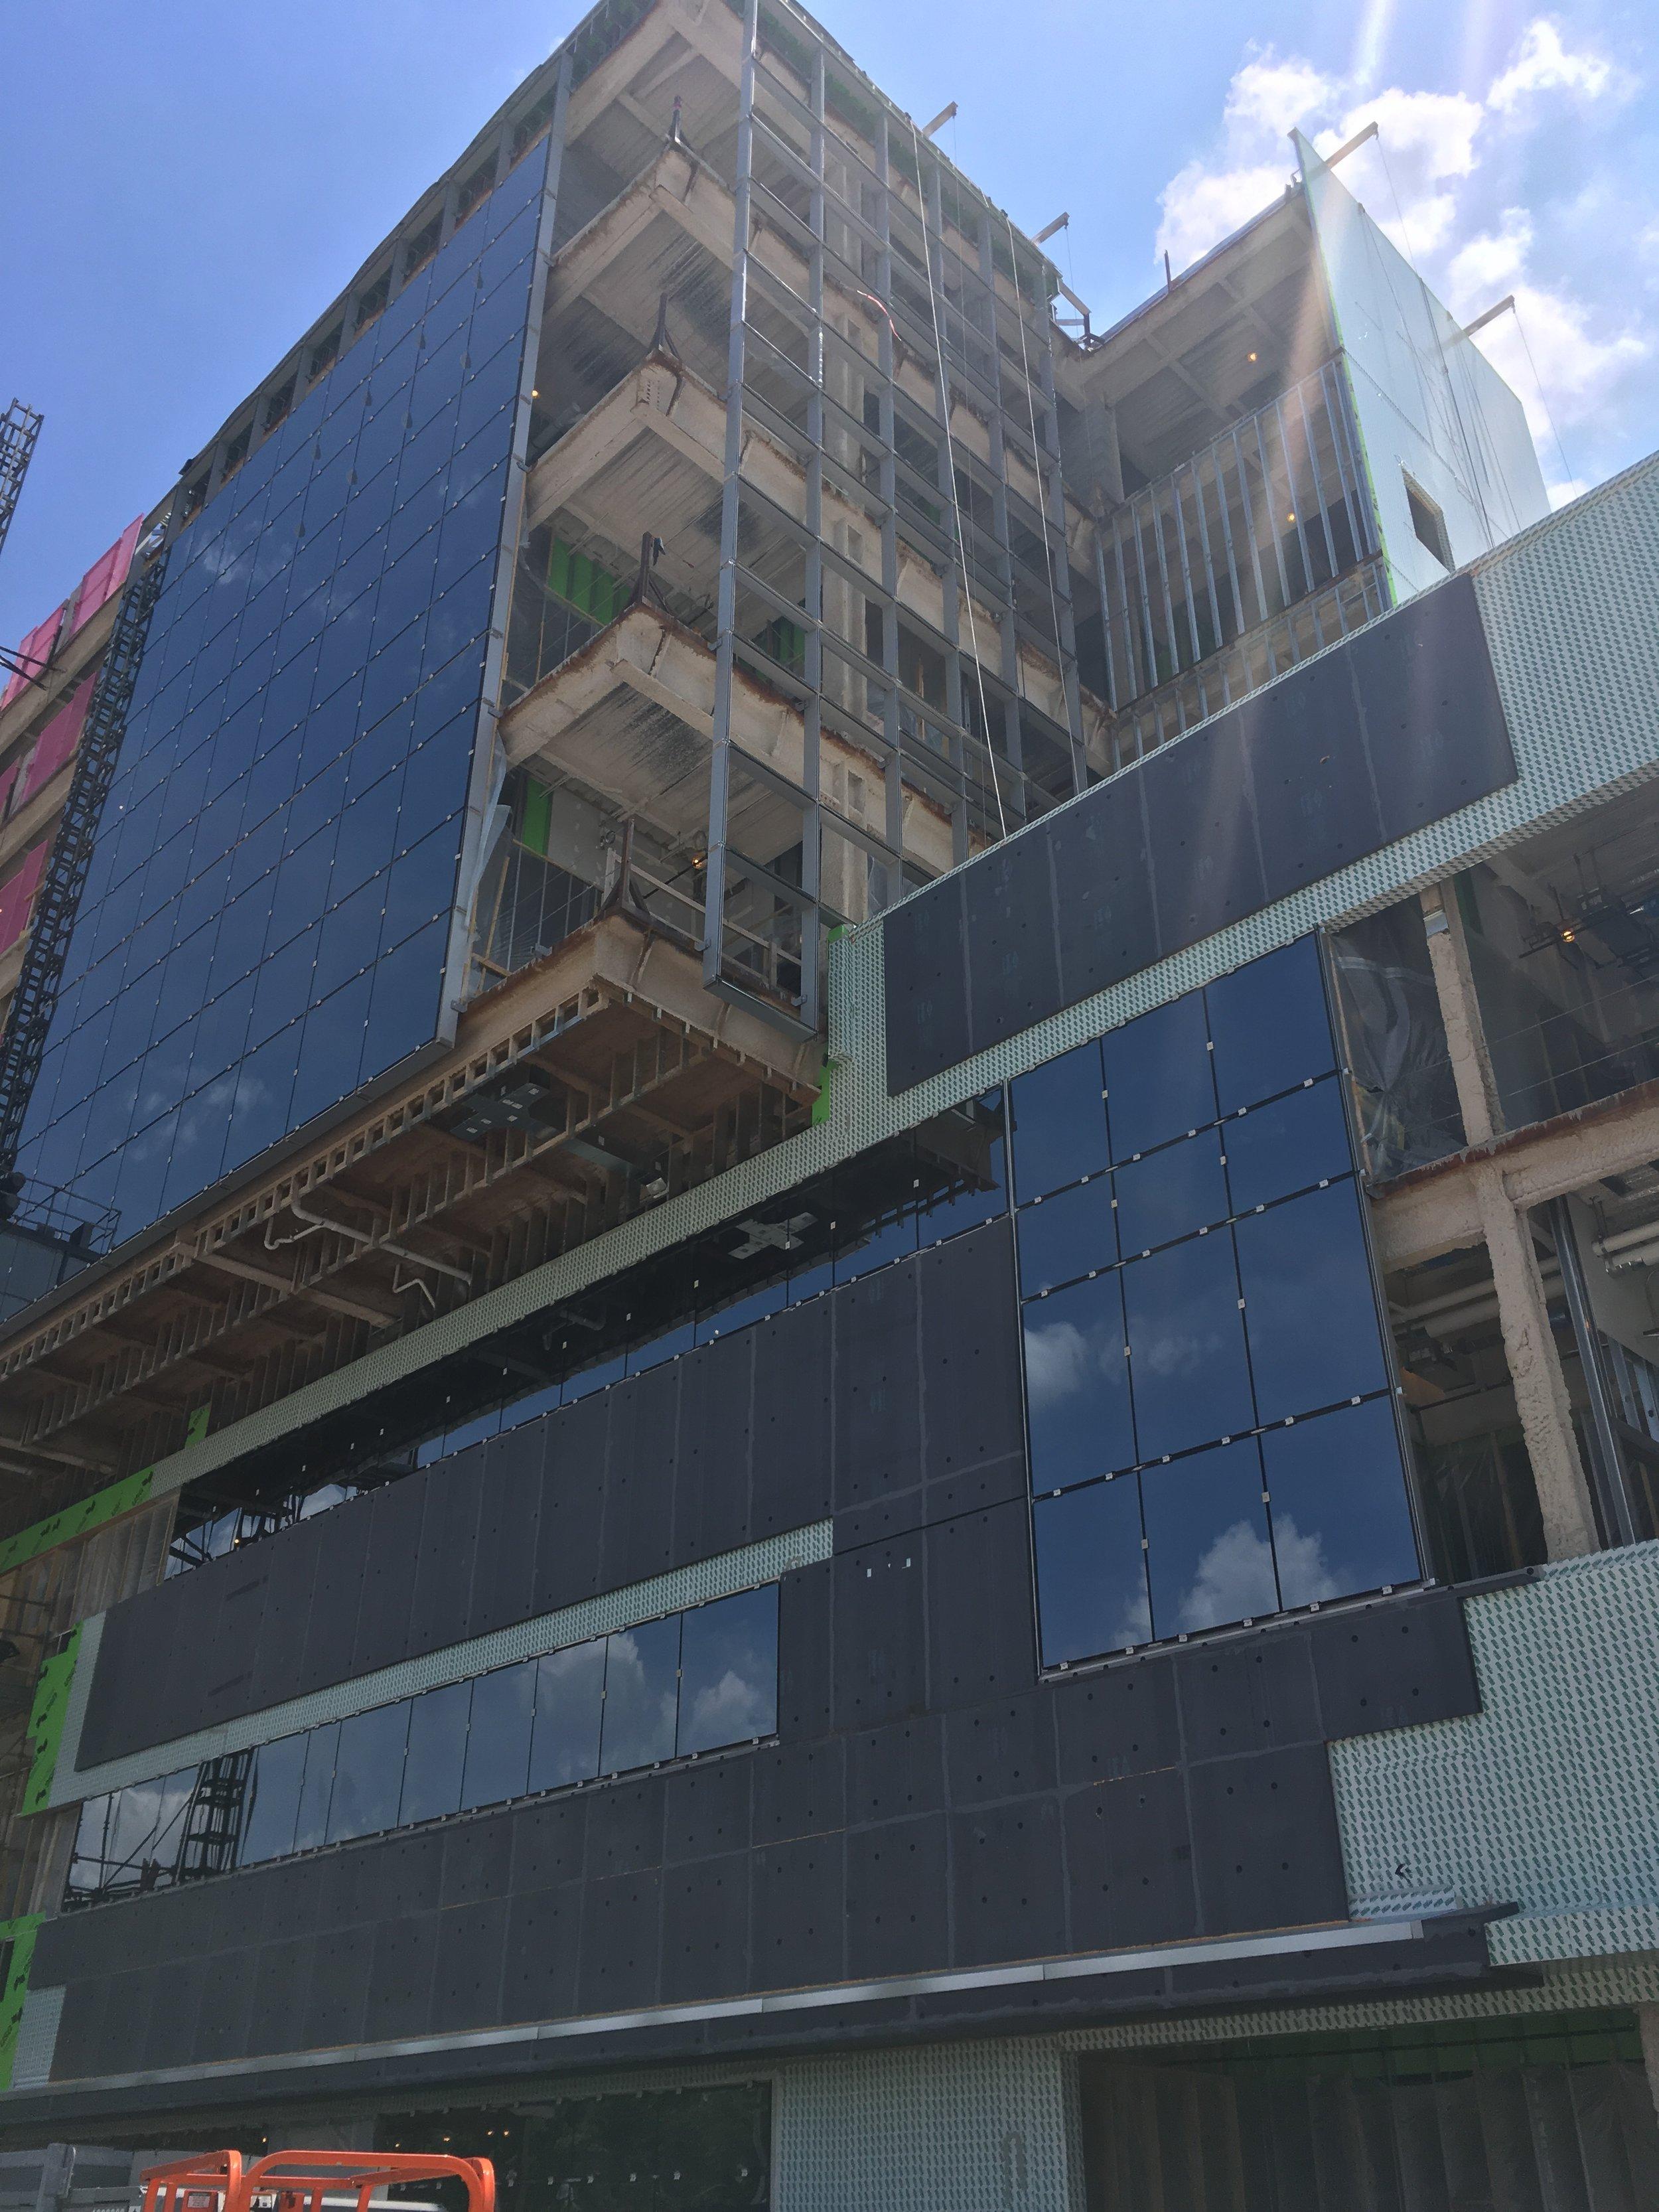 Building with exposure on northwest corner